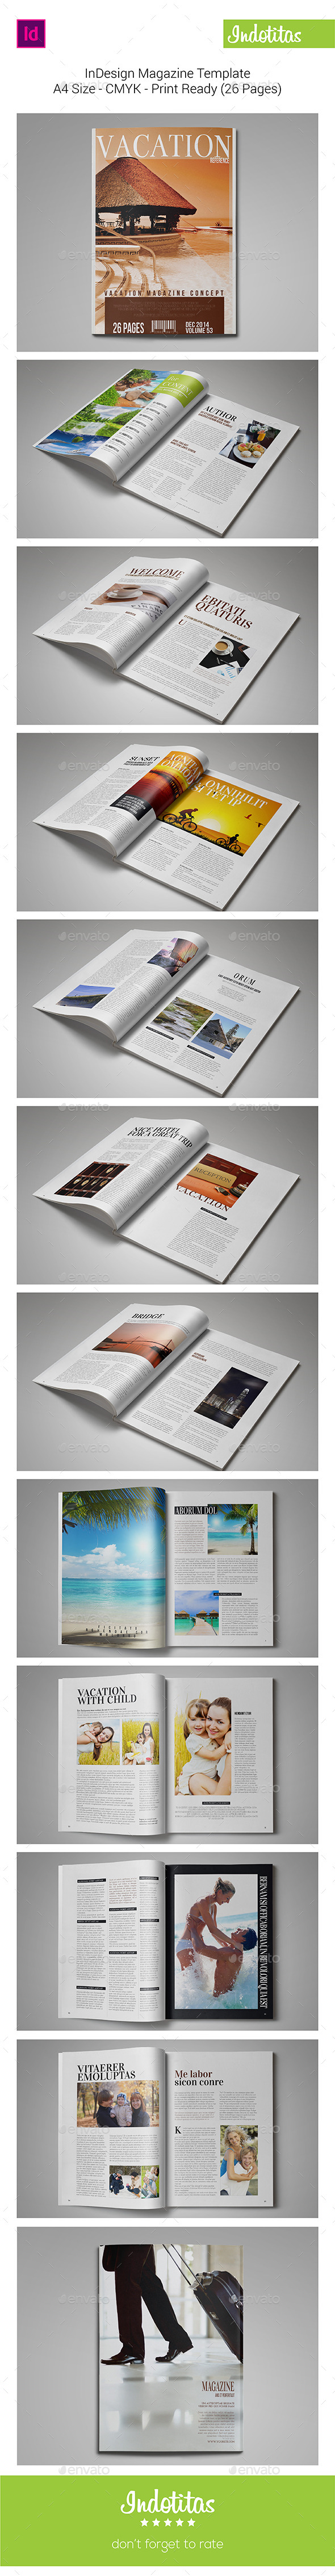 GraphicRiver InDesign Magazine Template 9301689